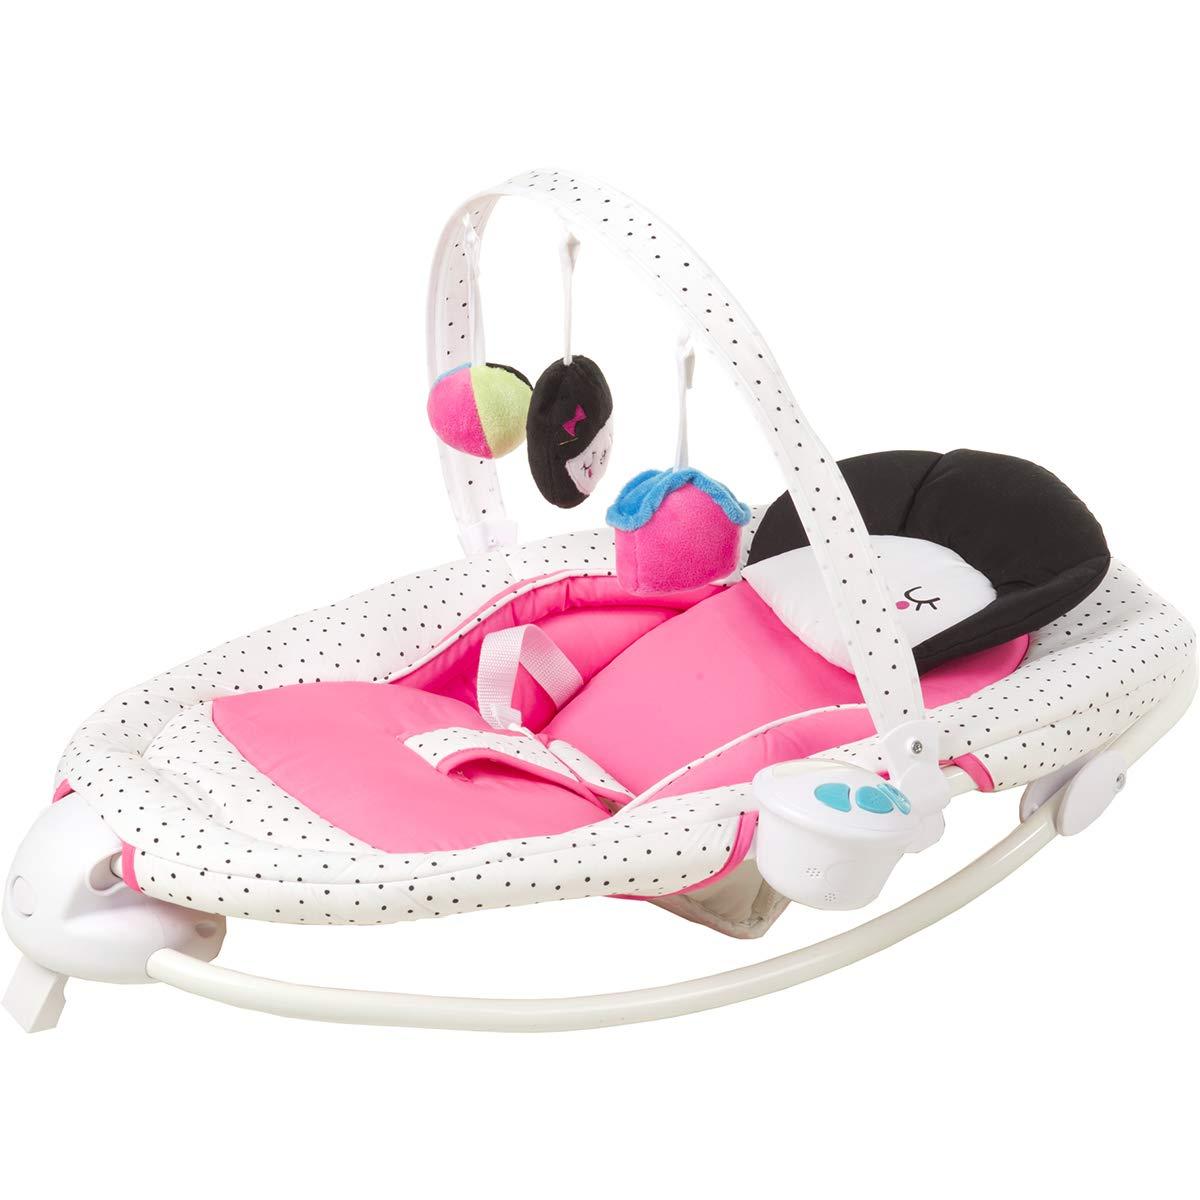 Tuc Tuc 07558 - Hamaca arco accesorios cojín, color rosa